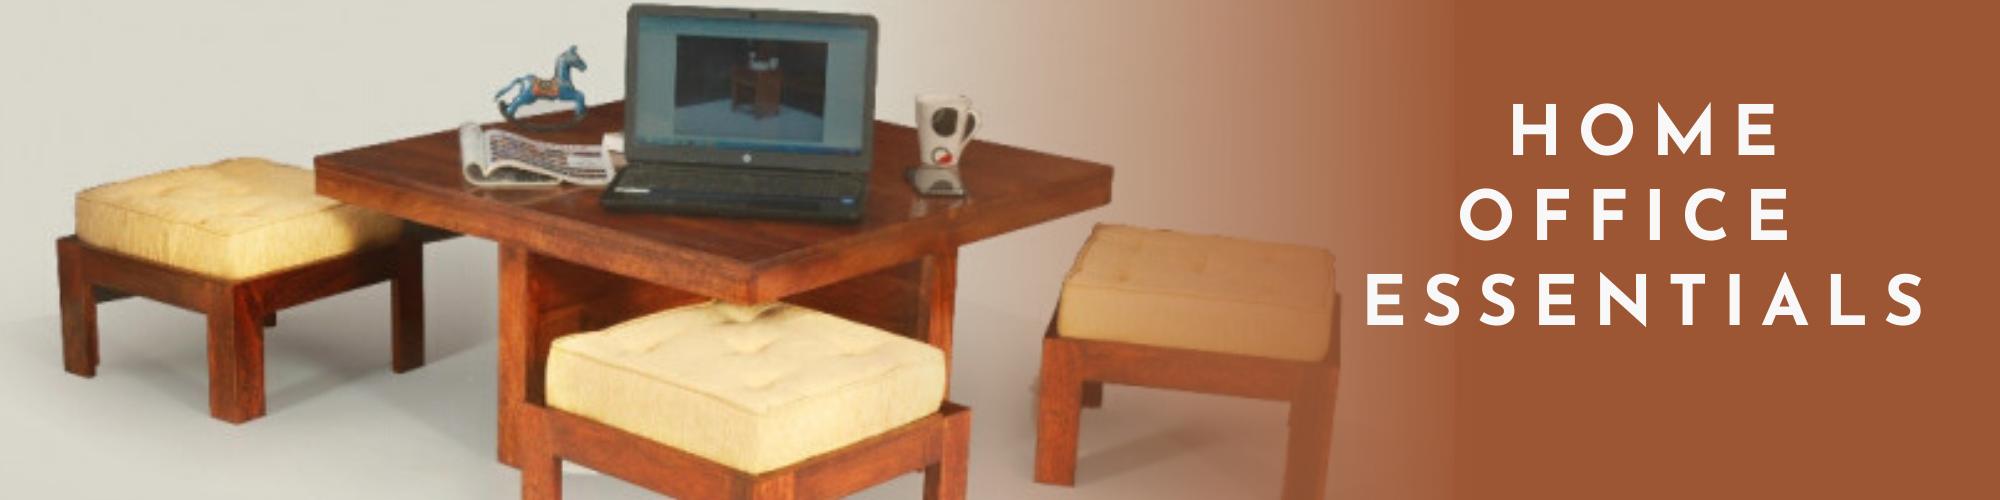 HomeOffice Essentials